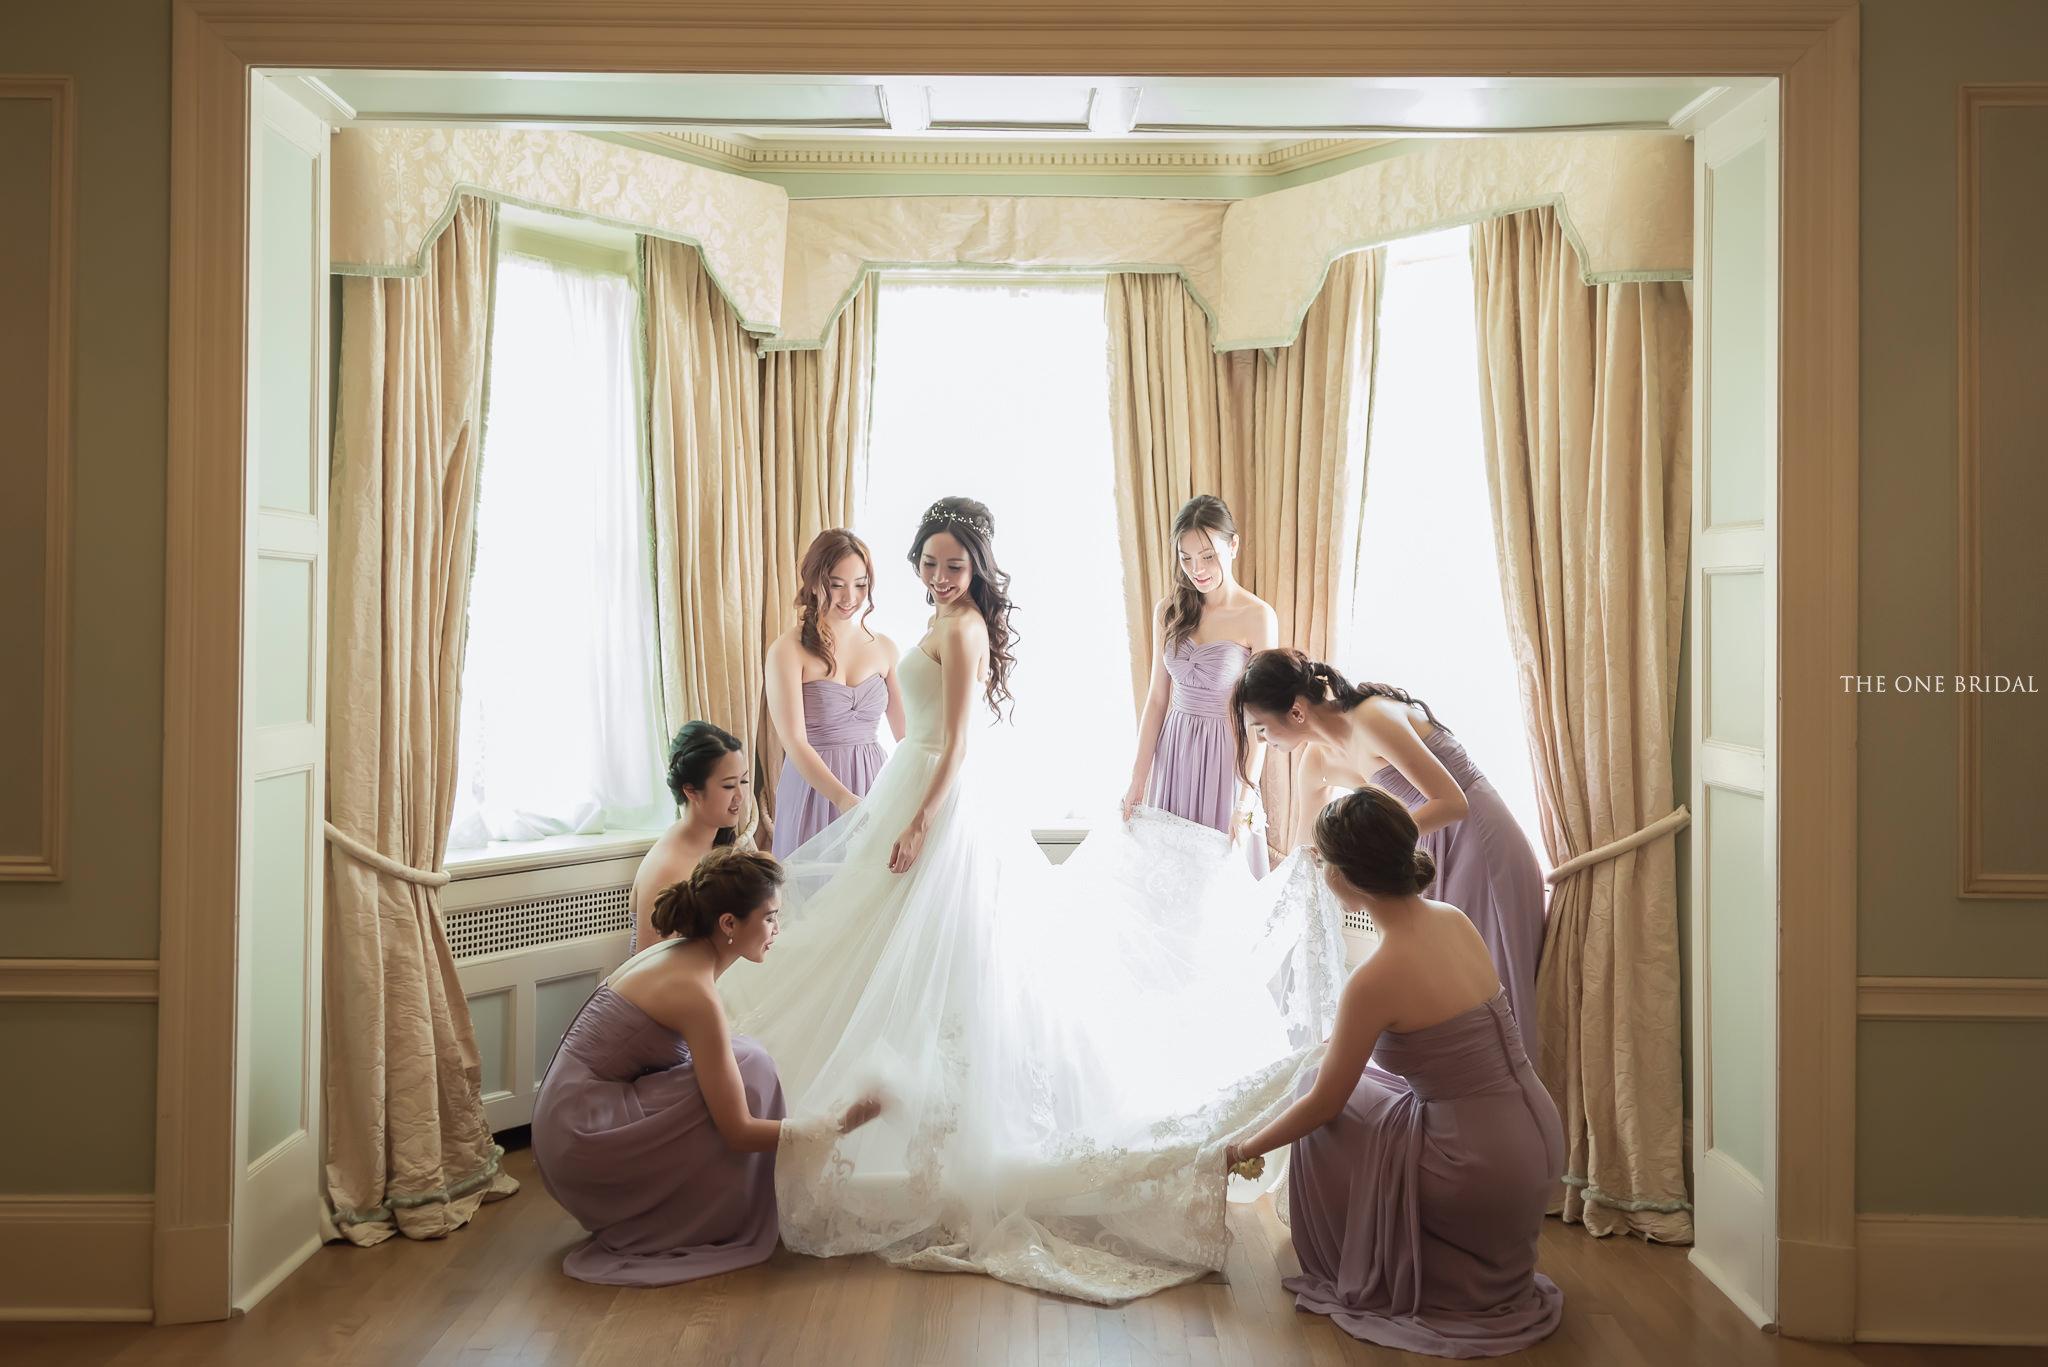 westin-prince-graydon-hall-wedding-051